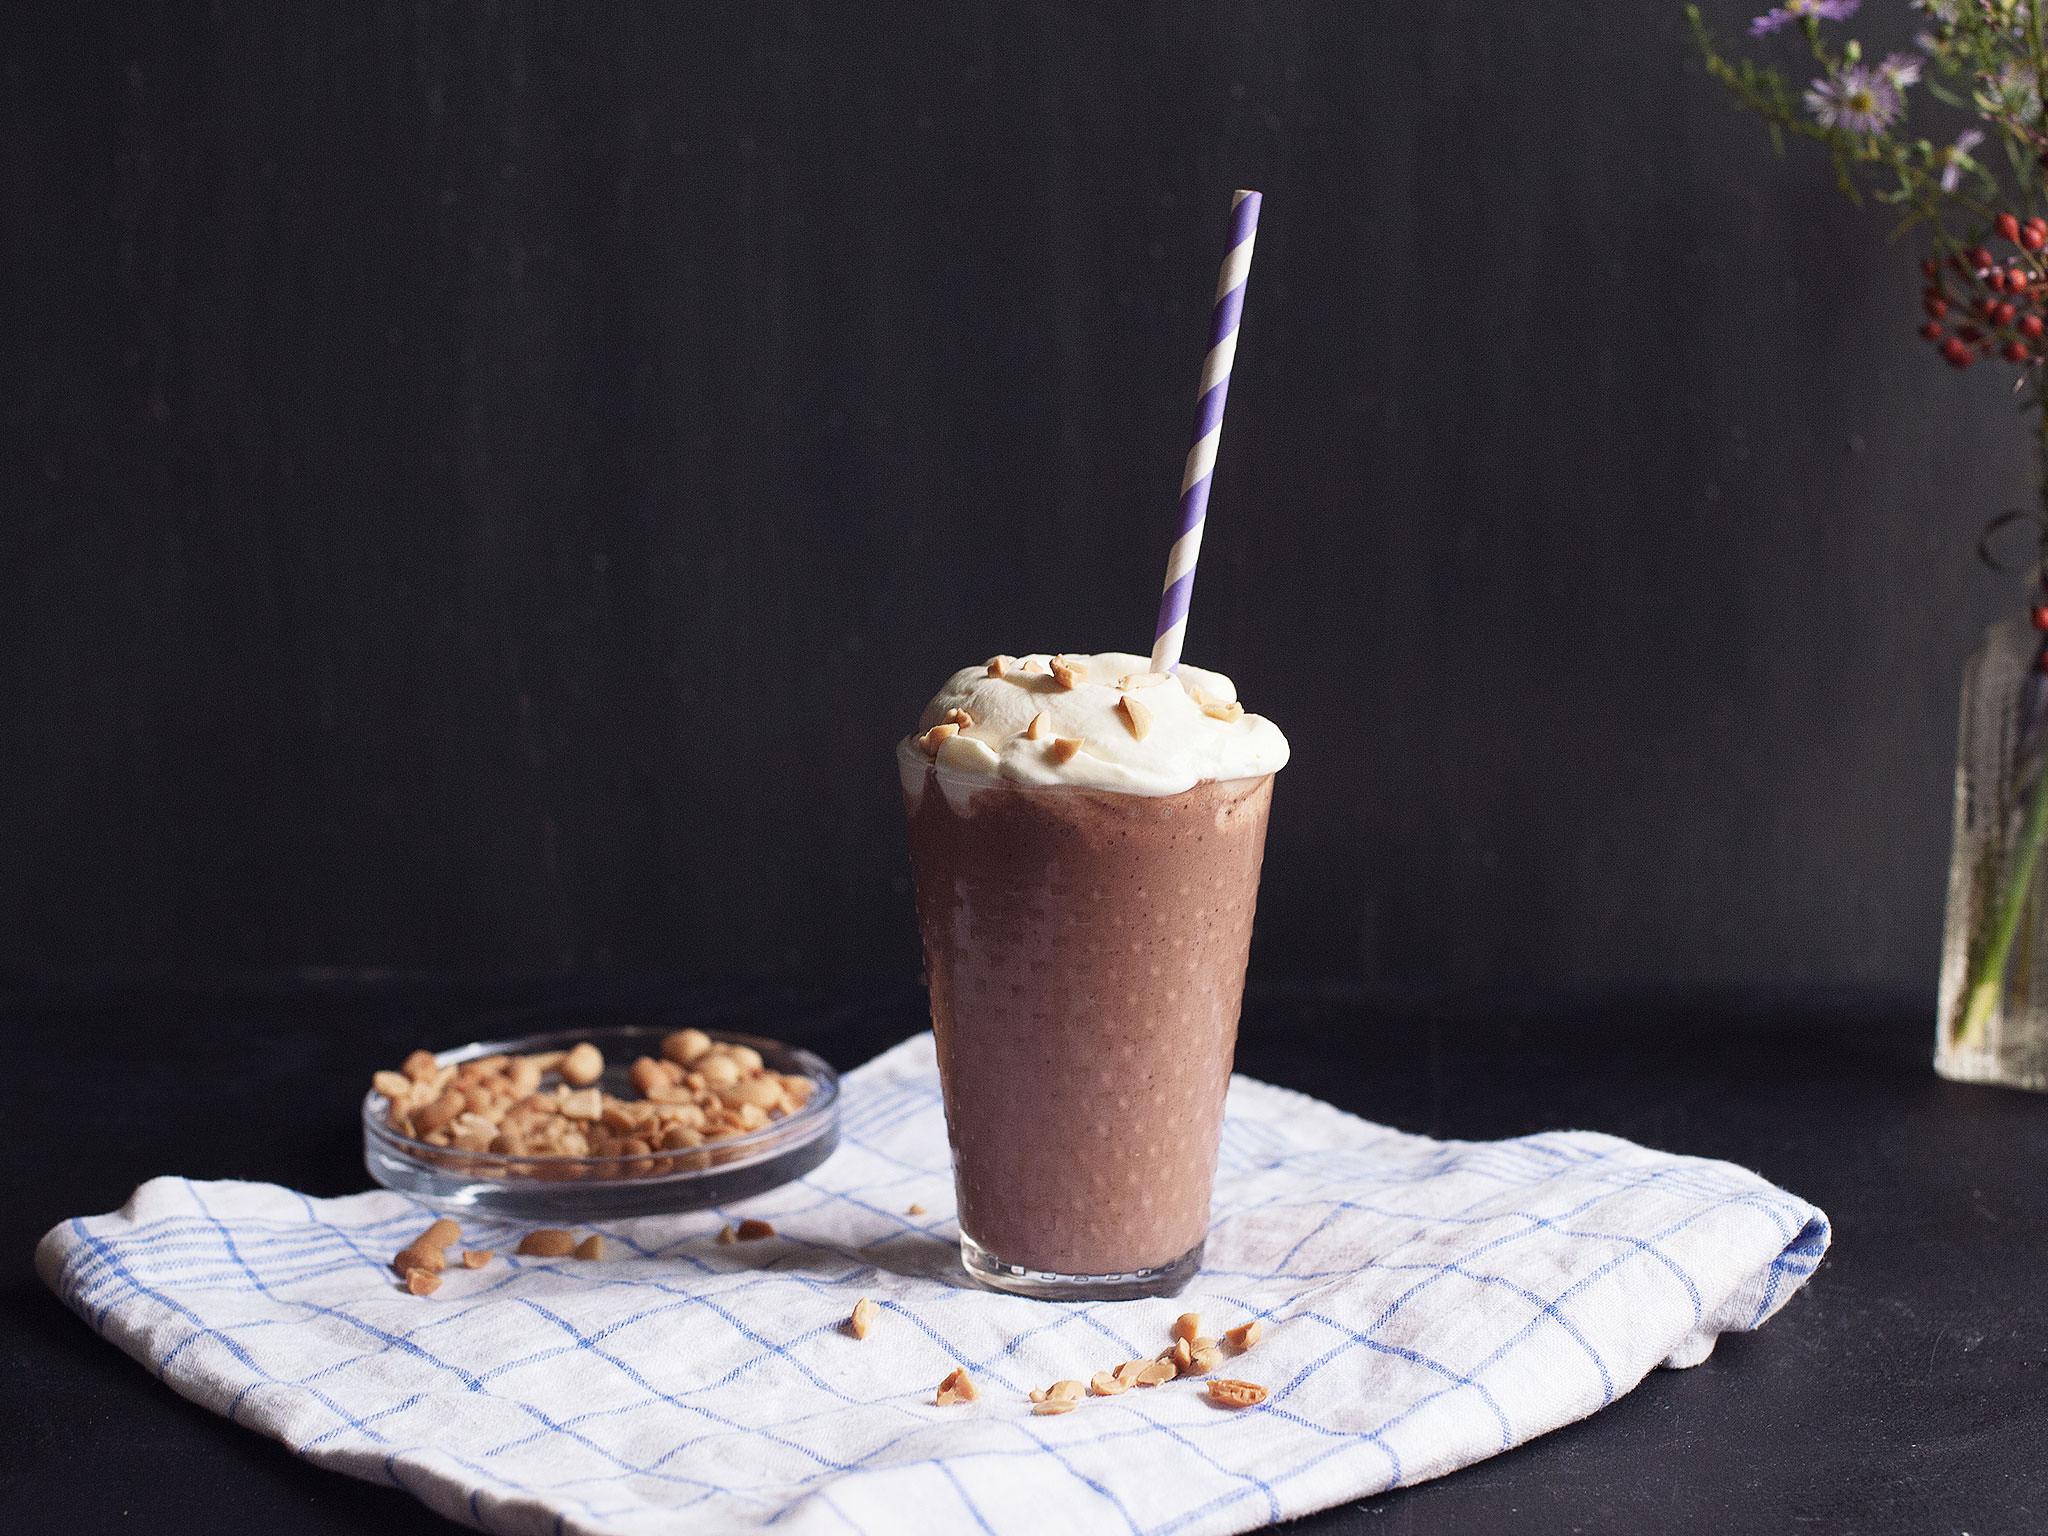 Kinder Chocolate Milkshake Recipe